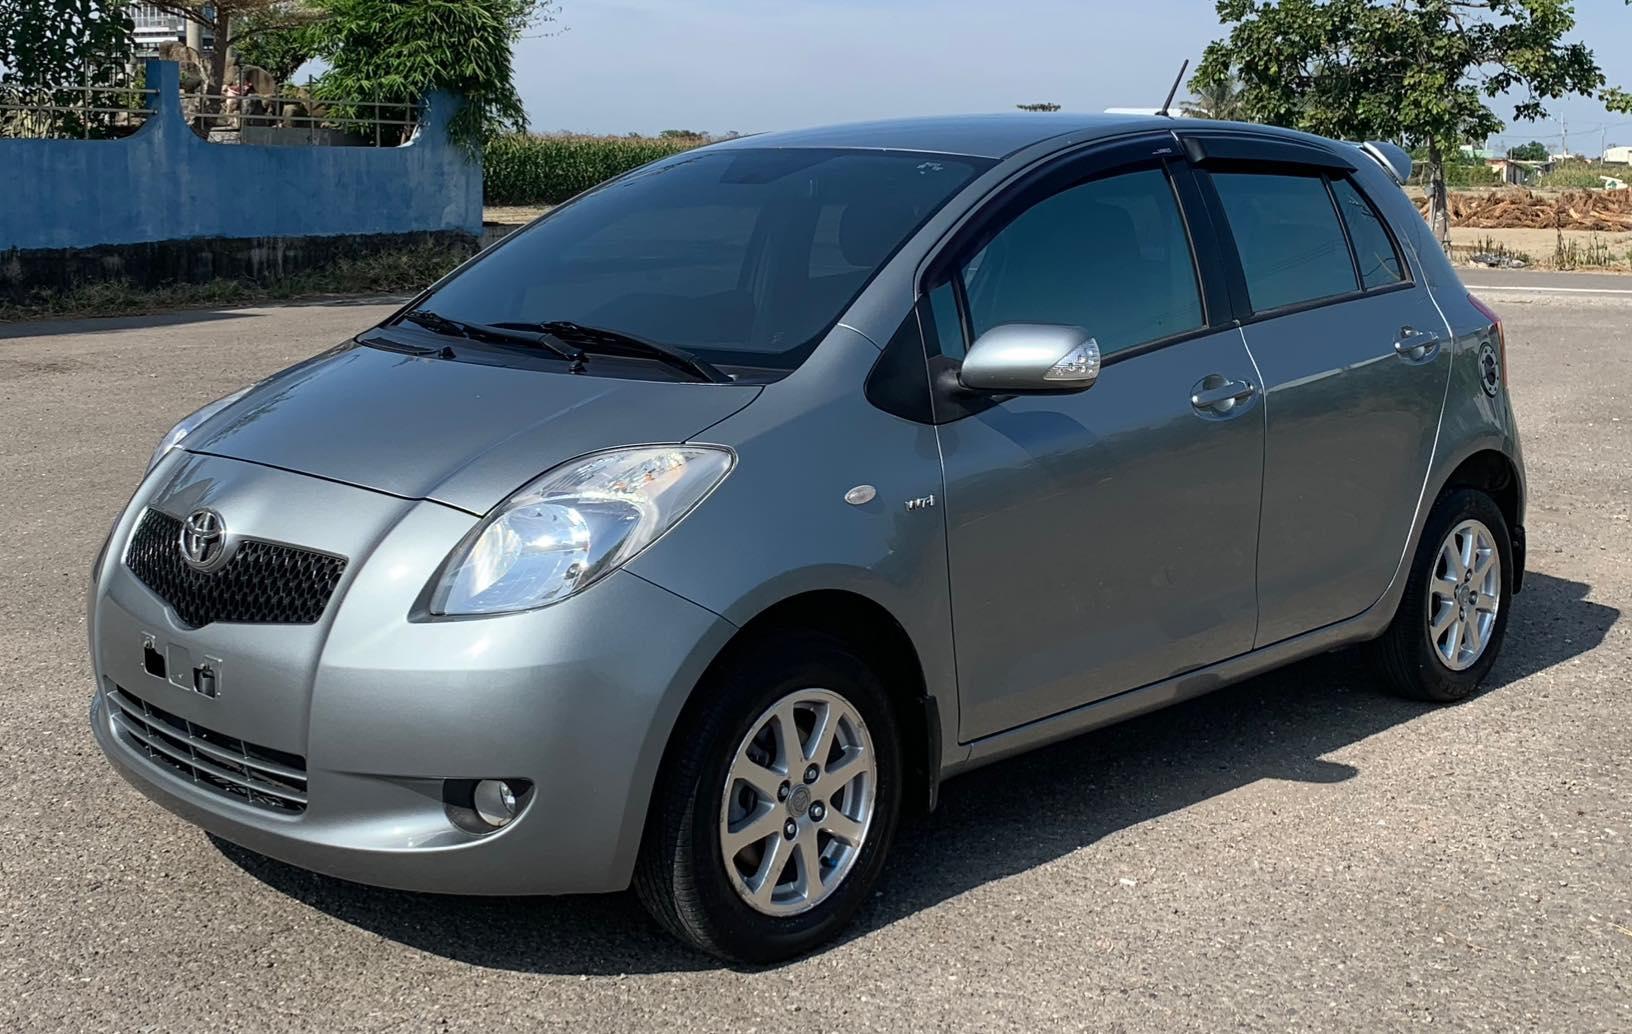 2009 Toyota 豐田 Yaris